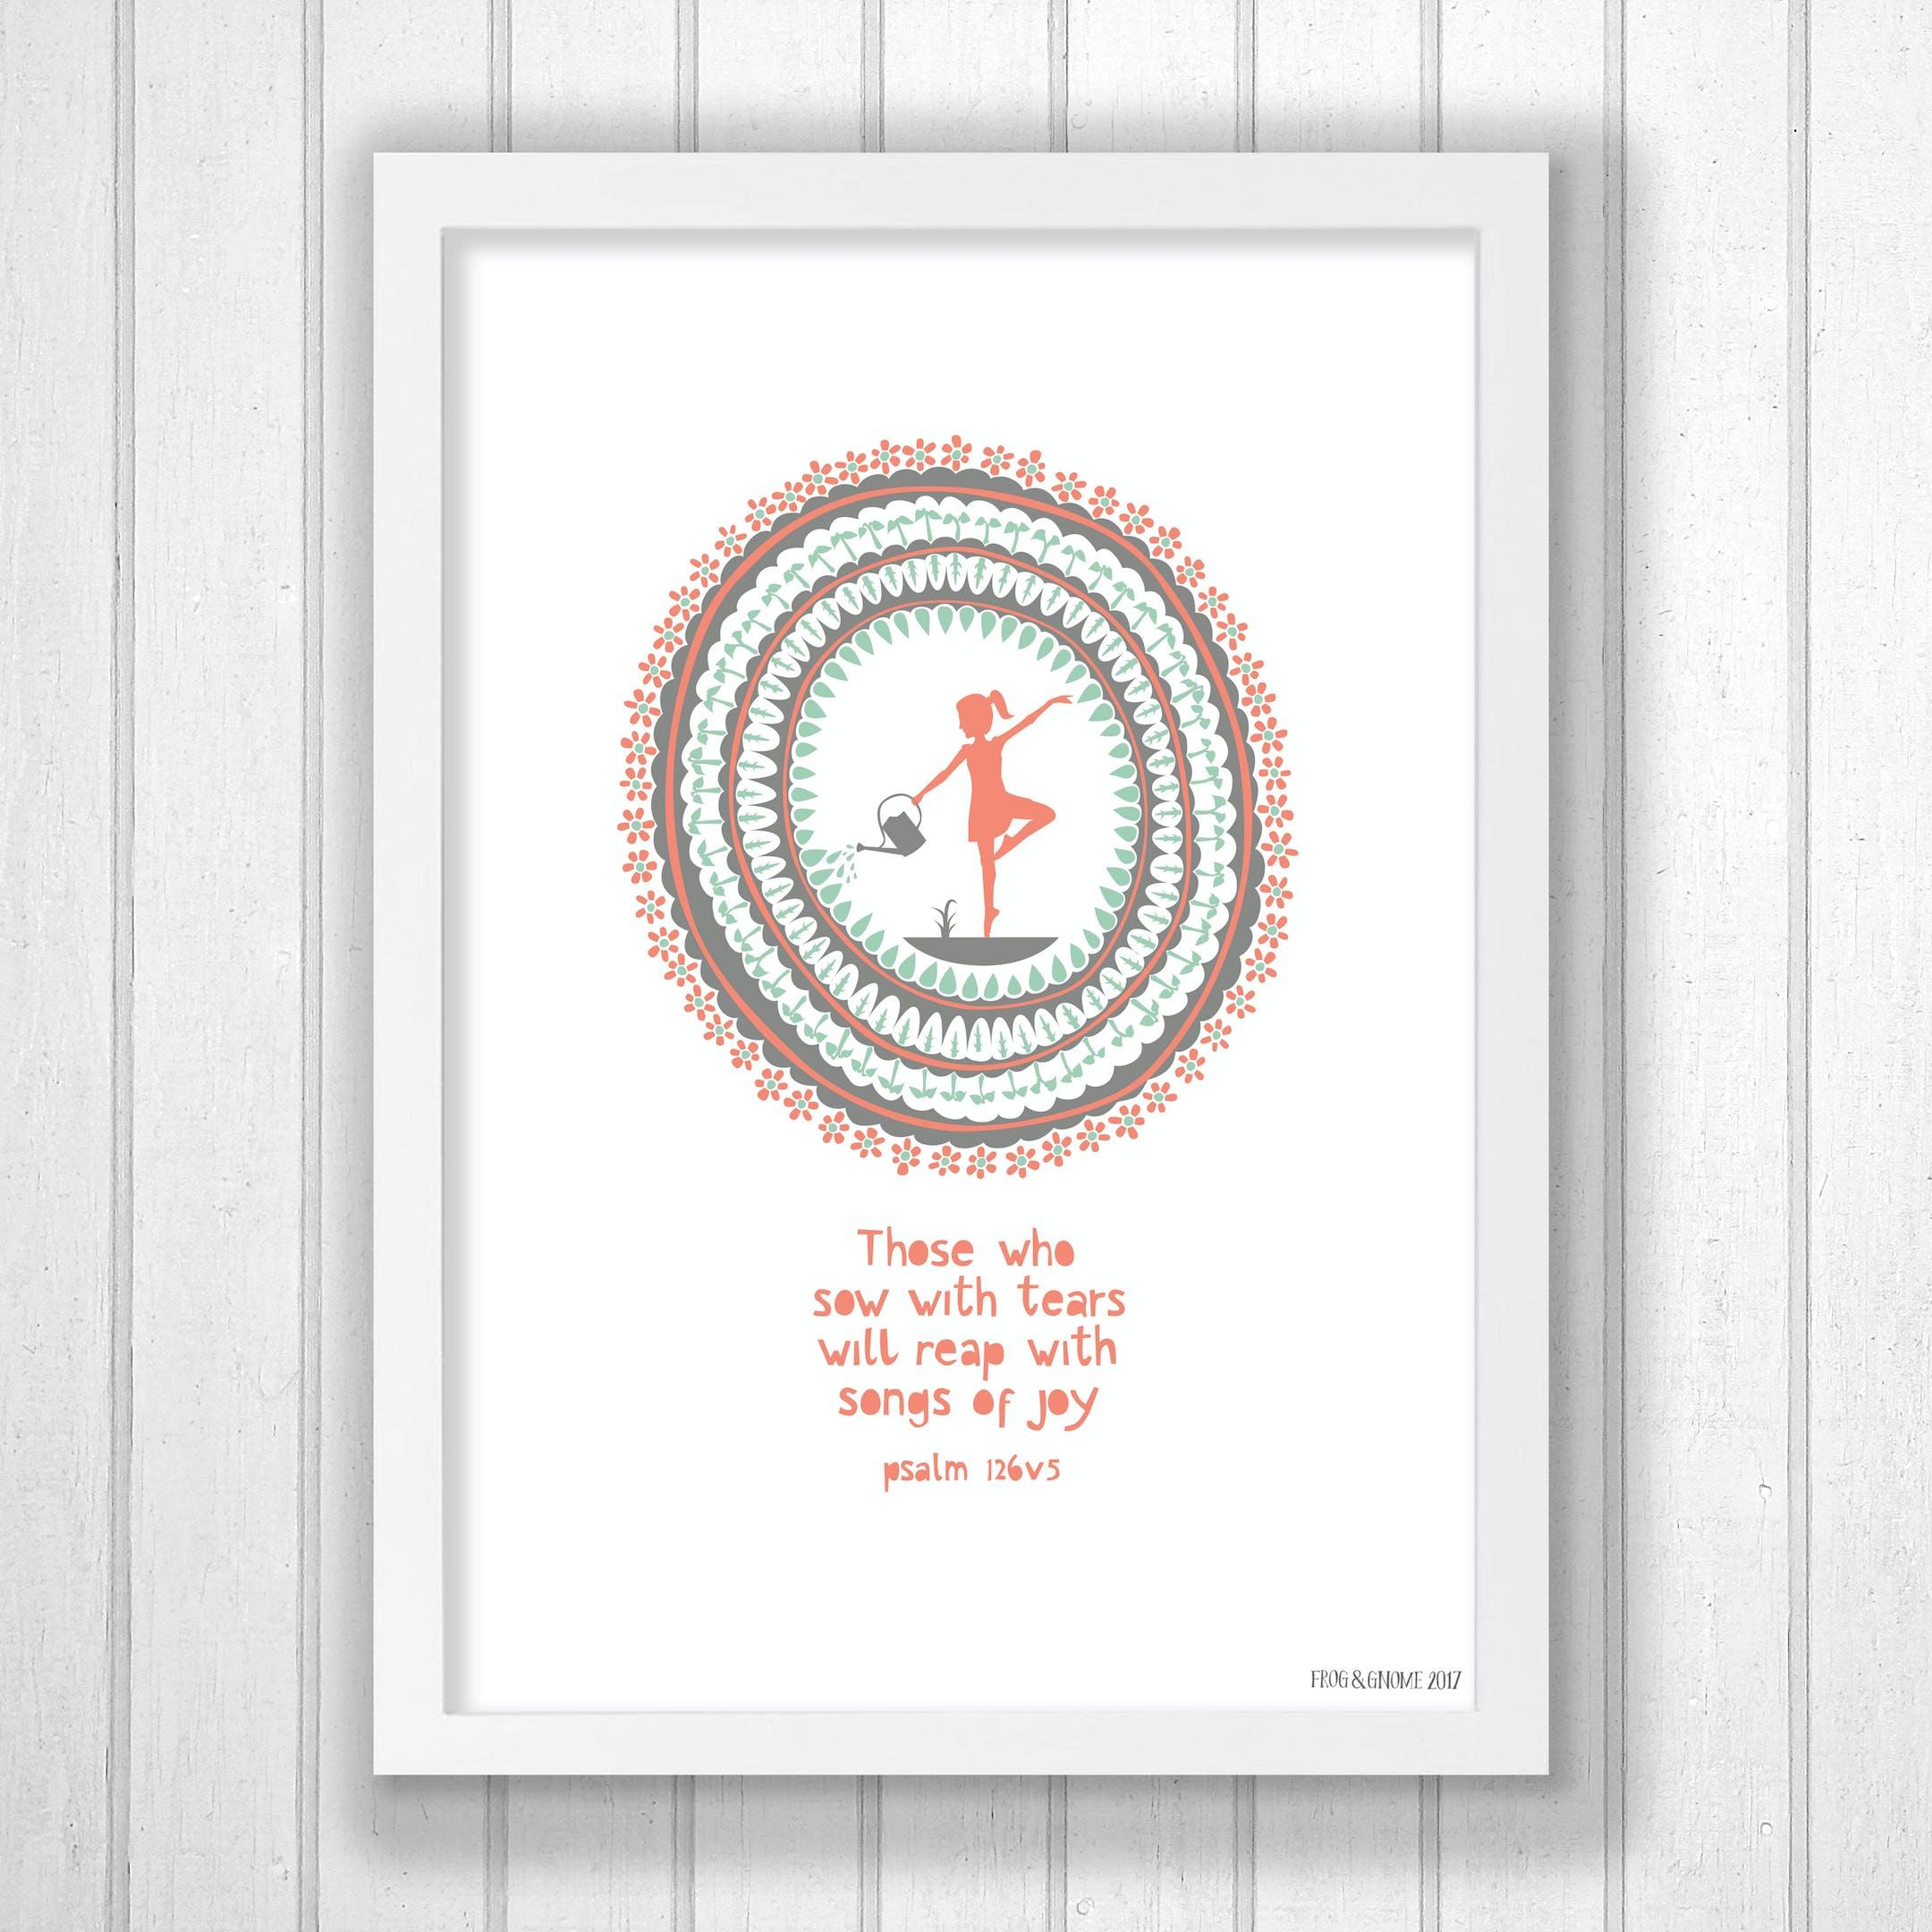 Joyful Dance Print - Psalm 126:5 - Frog and Gnome